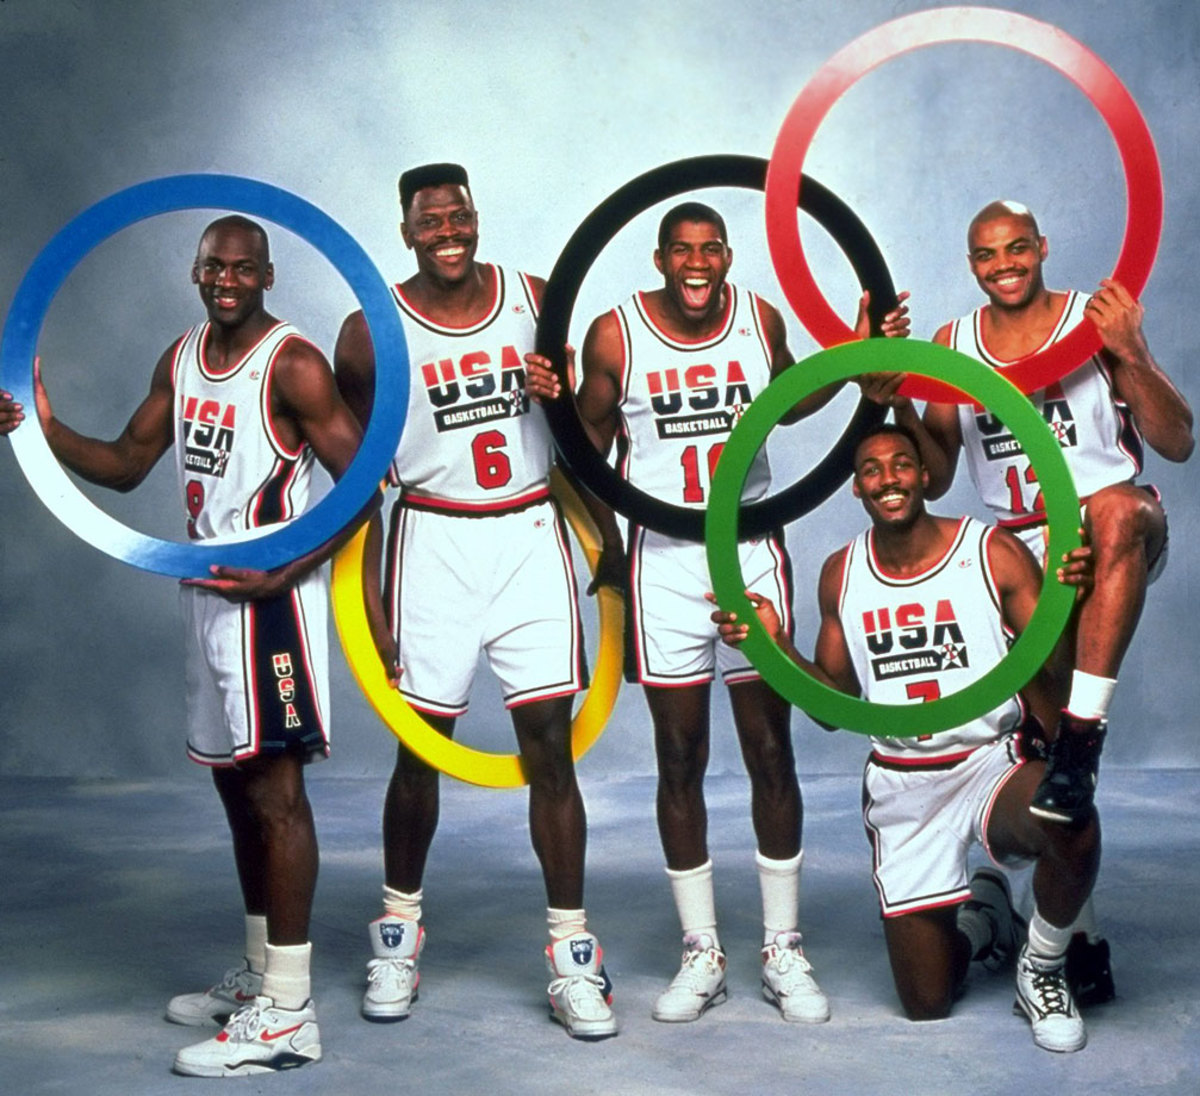 1992-Michael-Jordan-Patrick-Ewing-Magic-Johnson-Karl-Malone-Charles-Barkley-05047270.jpg